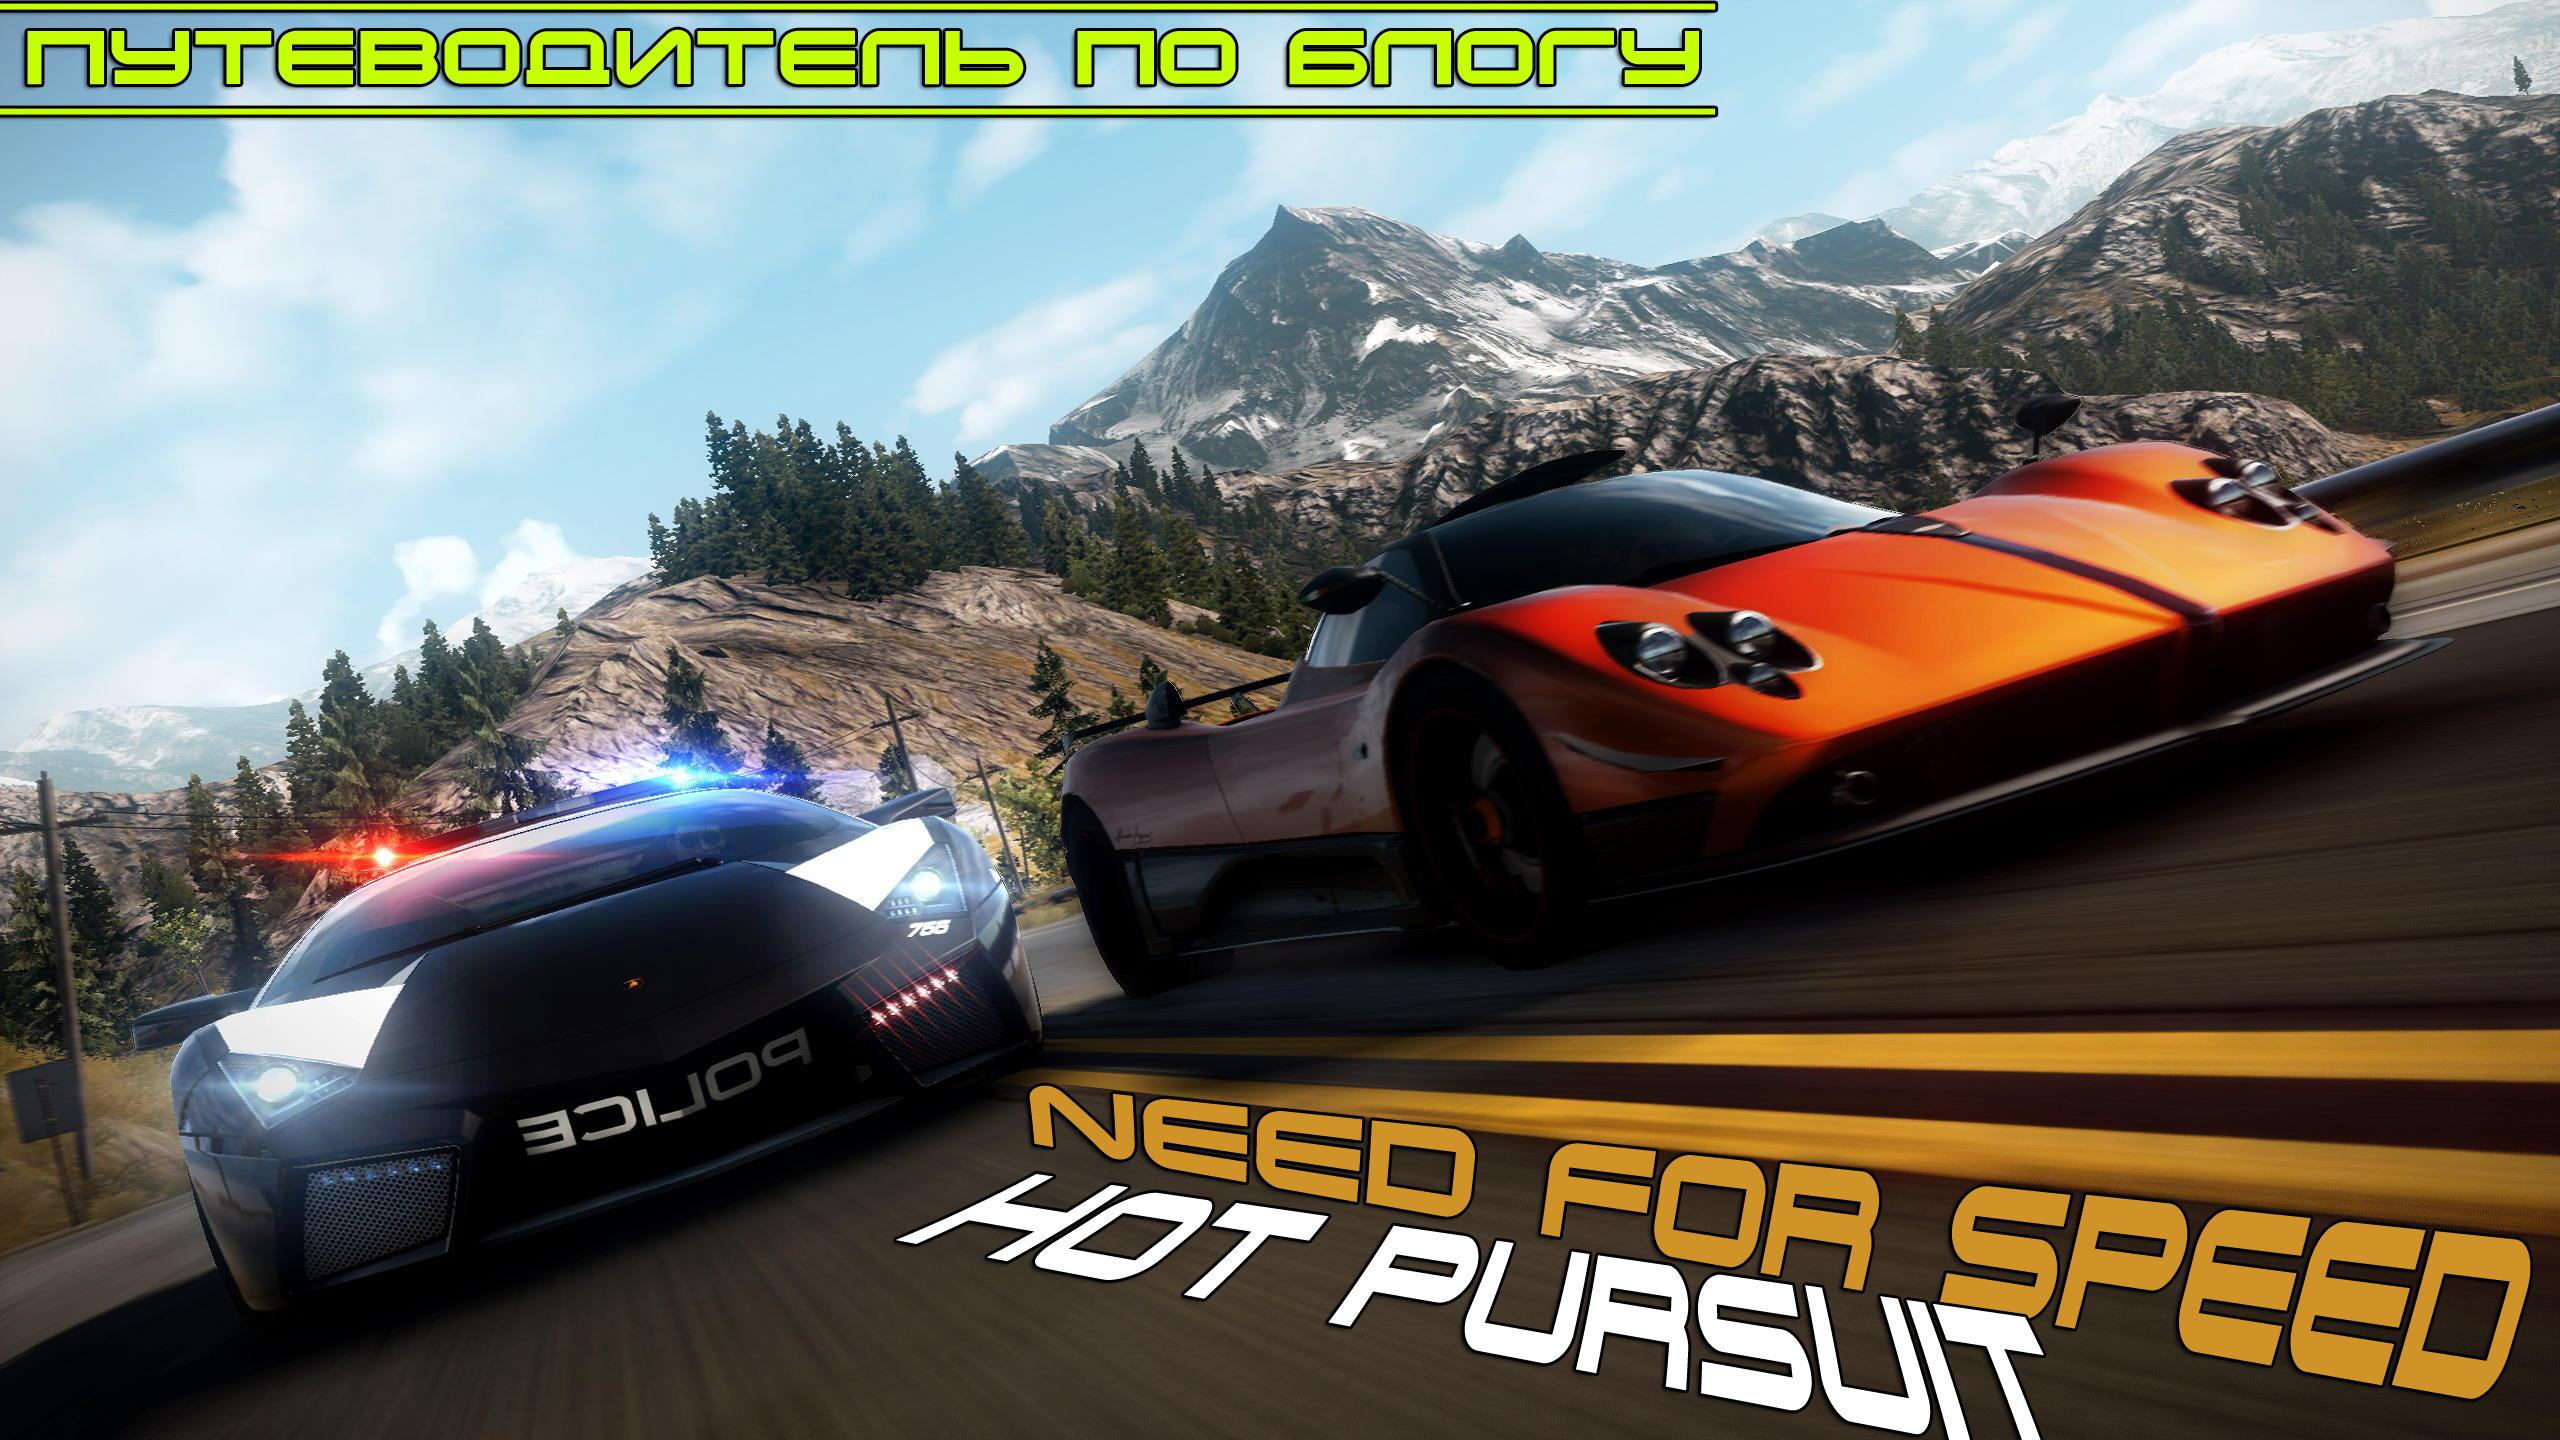 Обои hp, hot pursuit, Need for speed hot pursuit. Игры foto 18